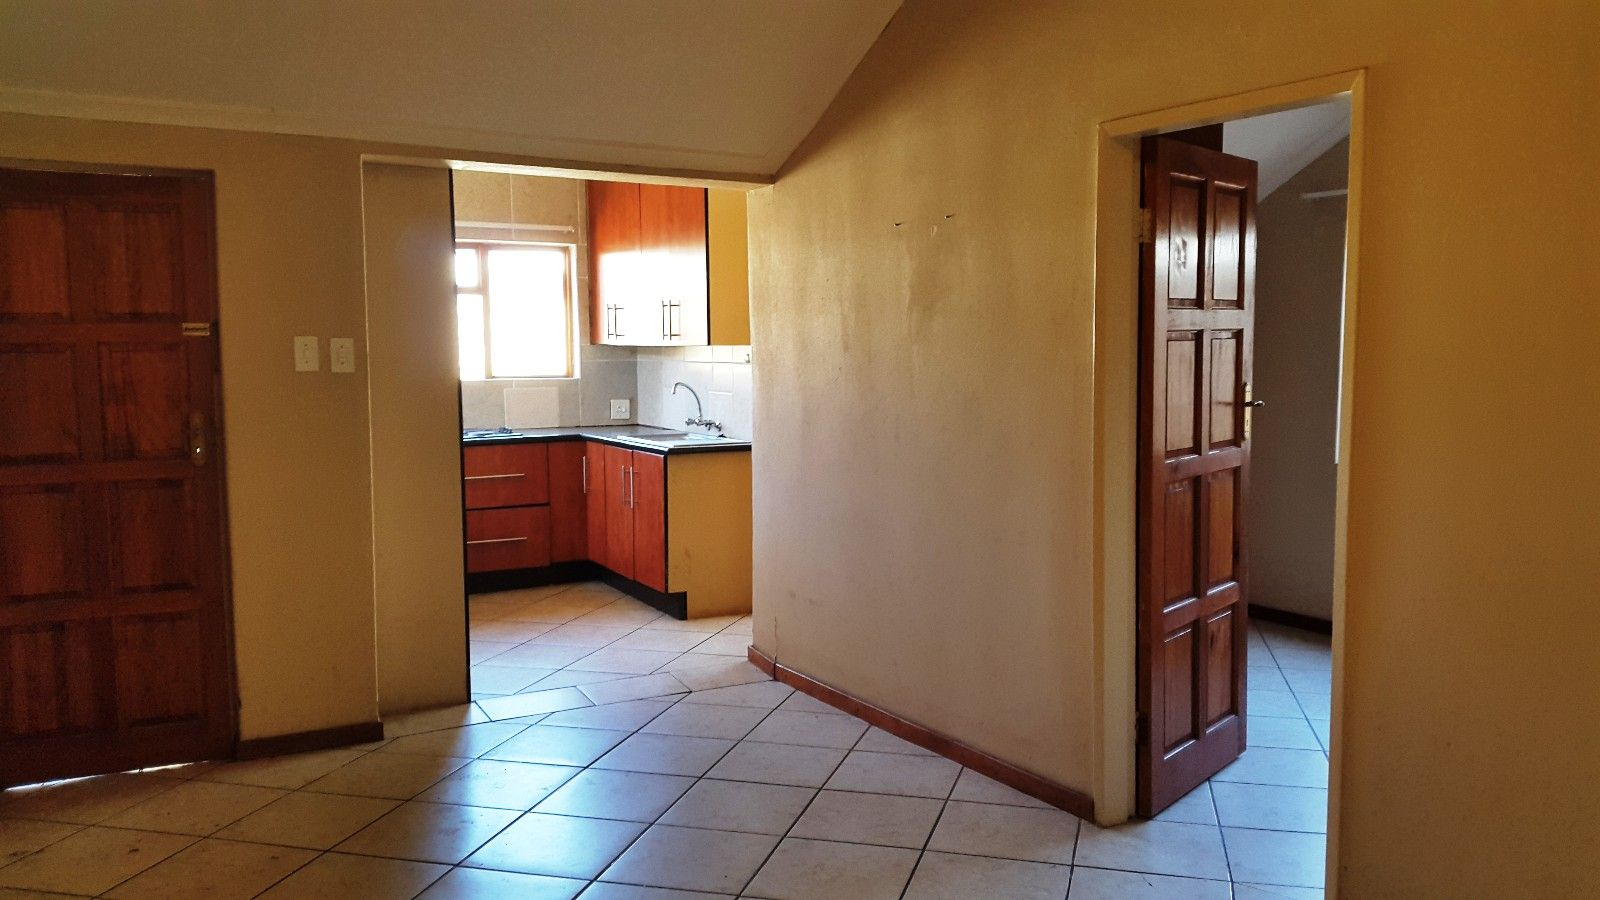 Baillie Park property for sale. Ref No: 13377937. Picture no 17